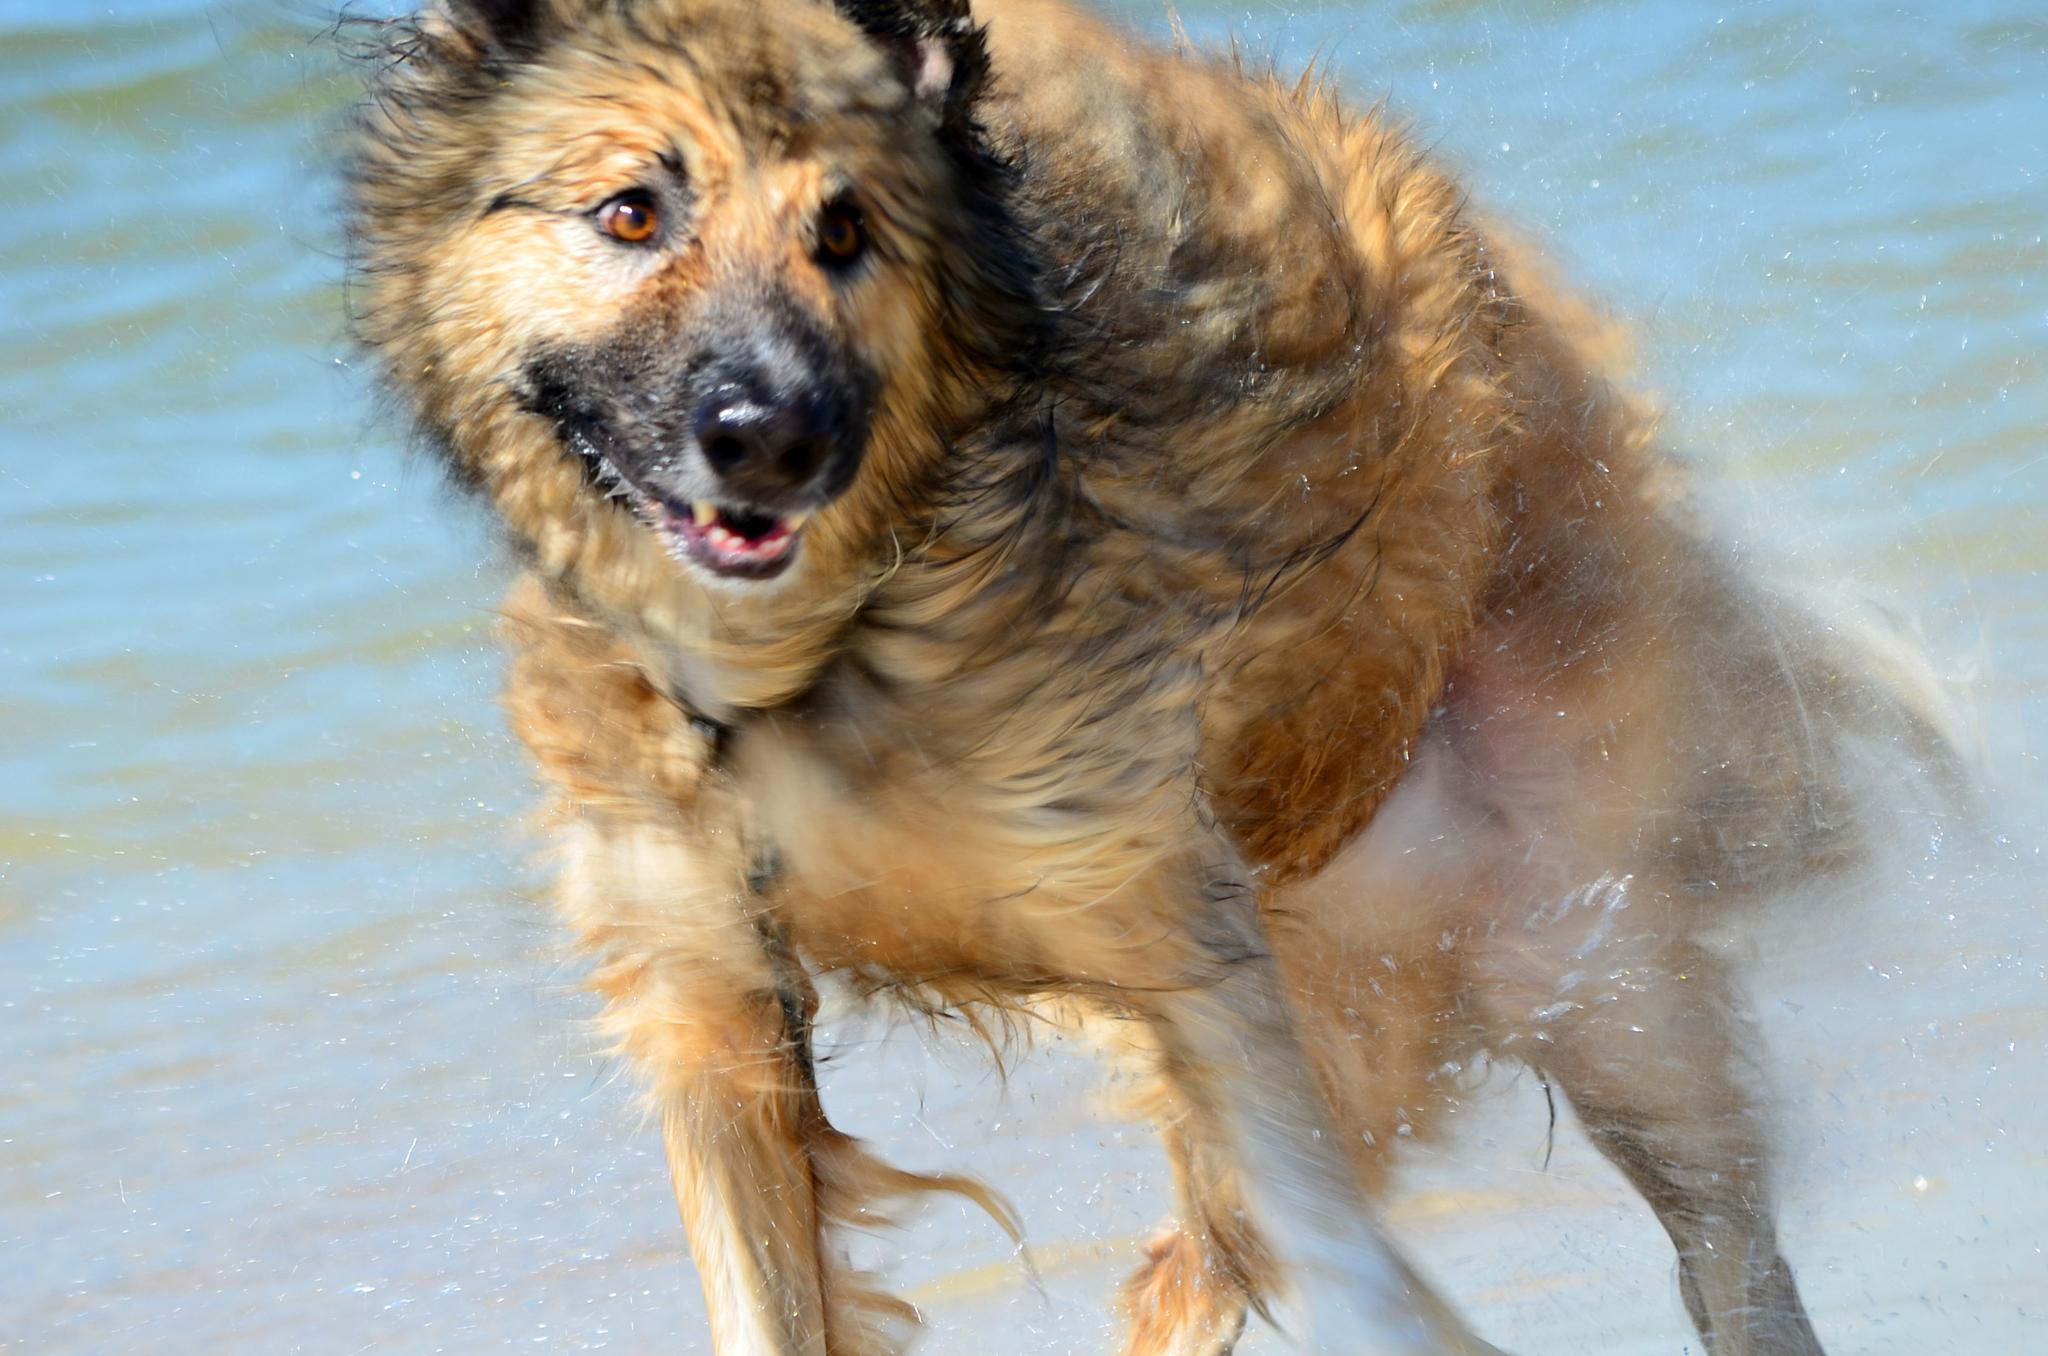 Dog Beachin' by laura.hammondkingsley